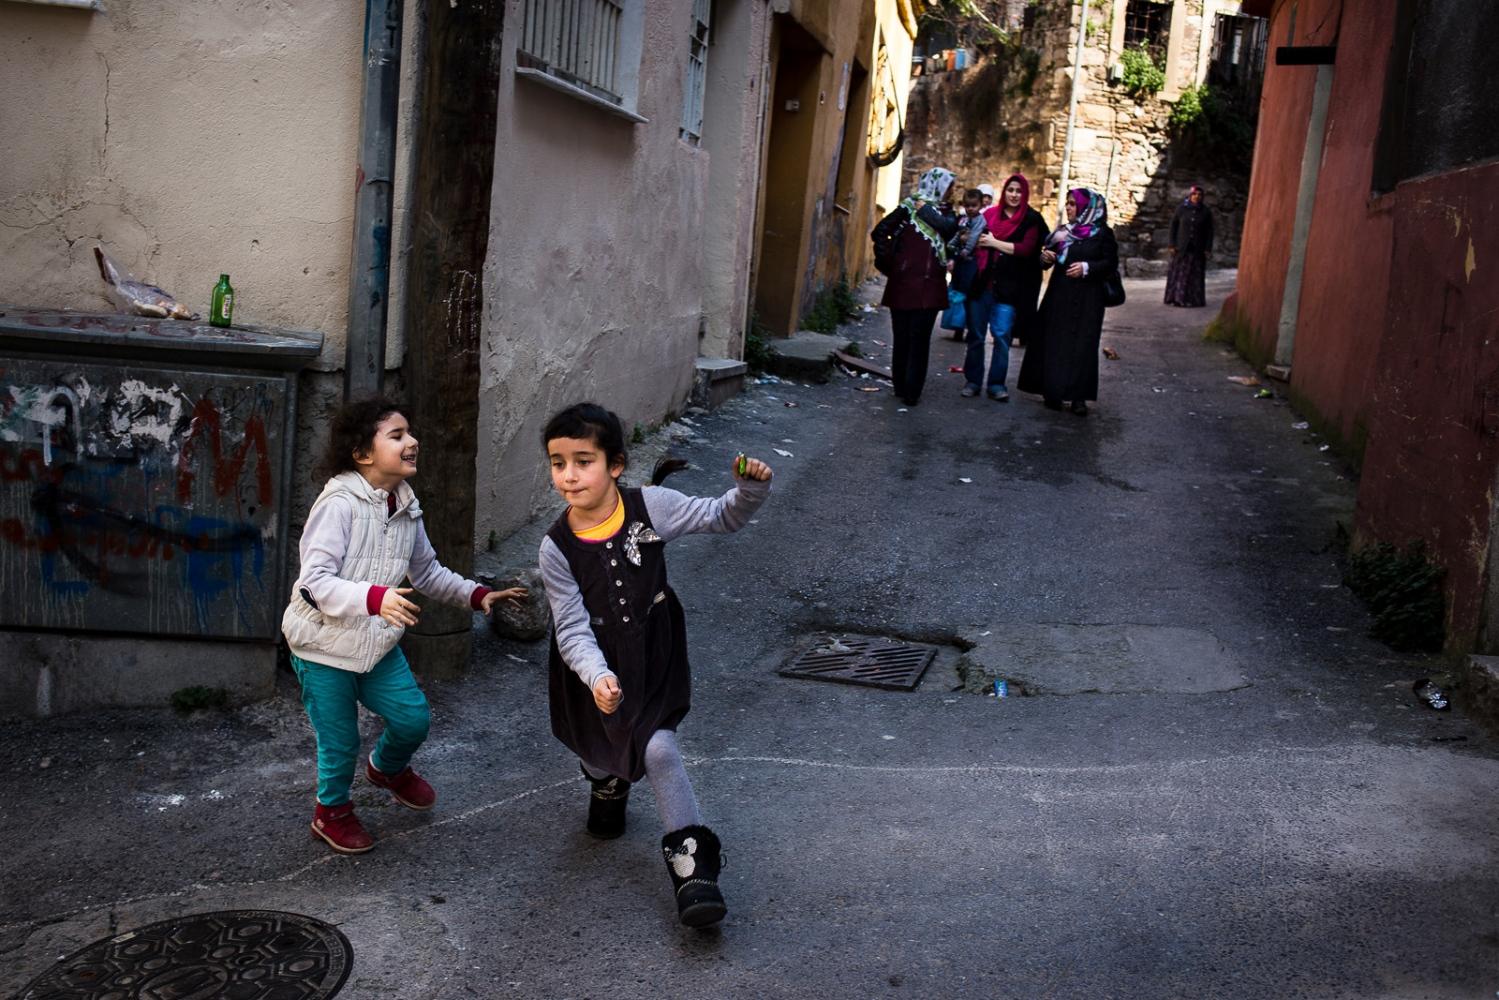 leger-refugees-limbo-turkey-04.jpg